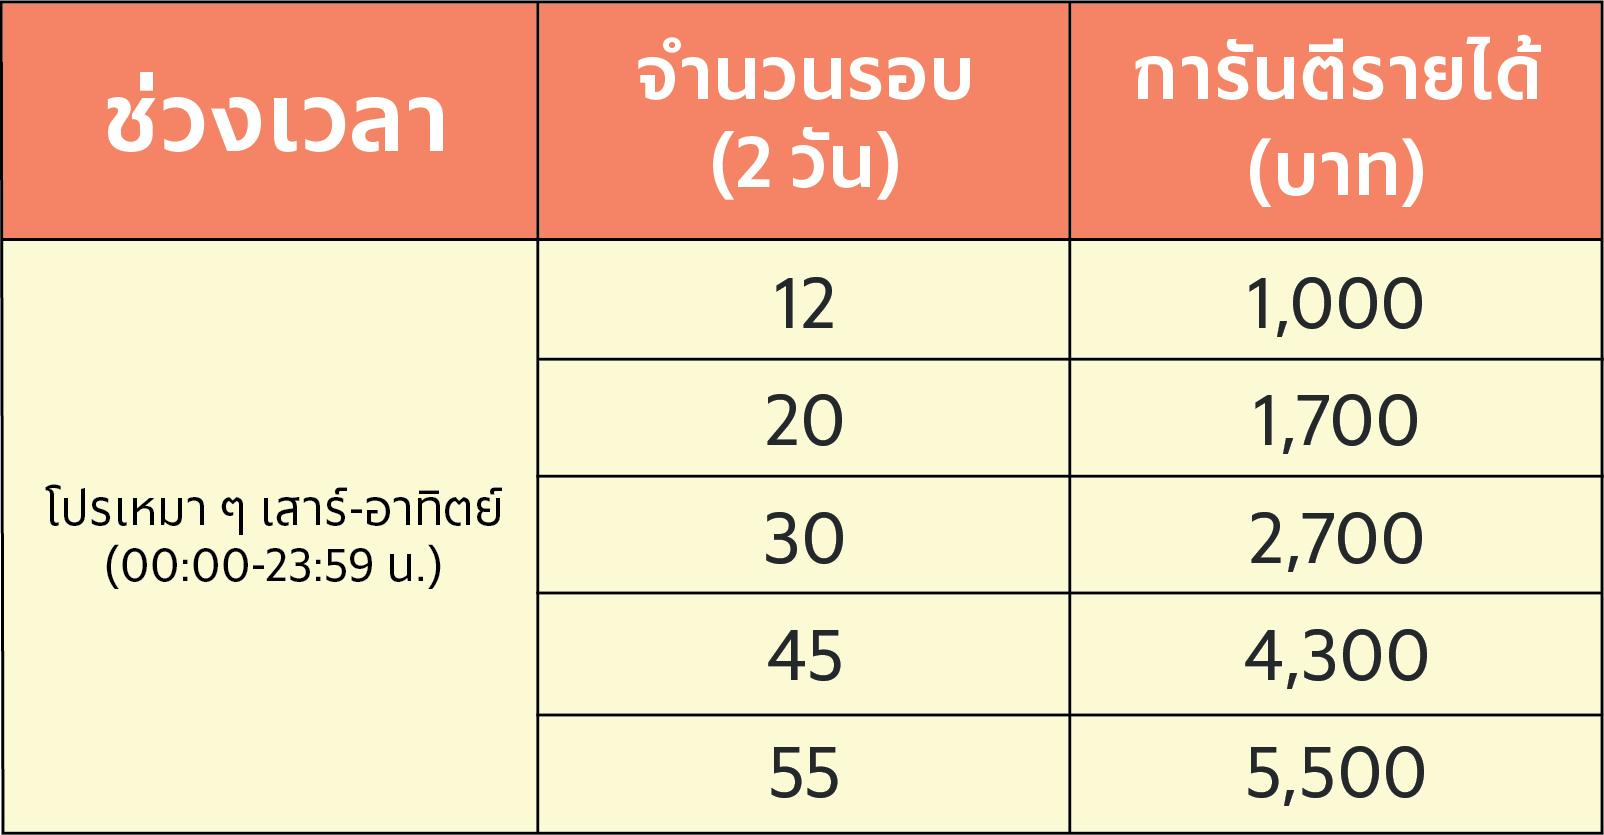 incentive OTC sat-sun_Incentive 15.jpg